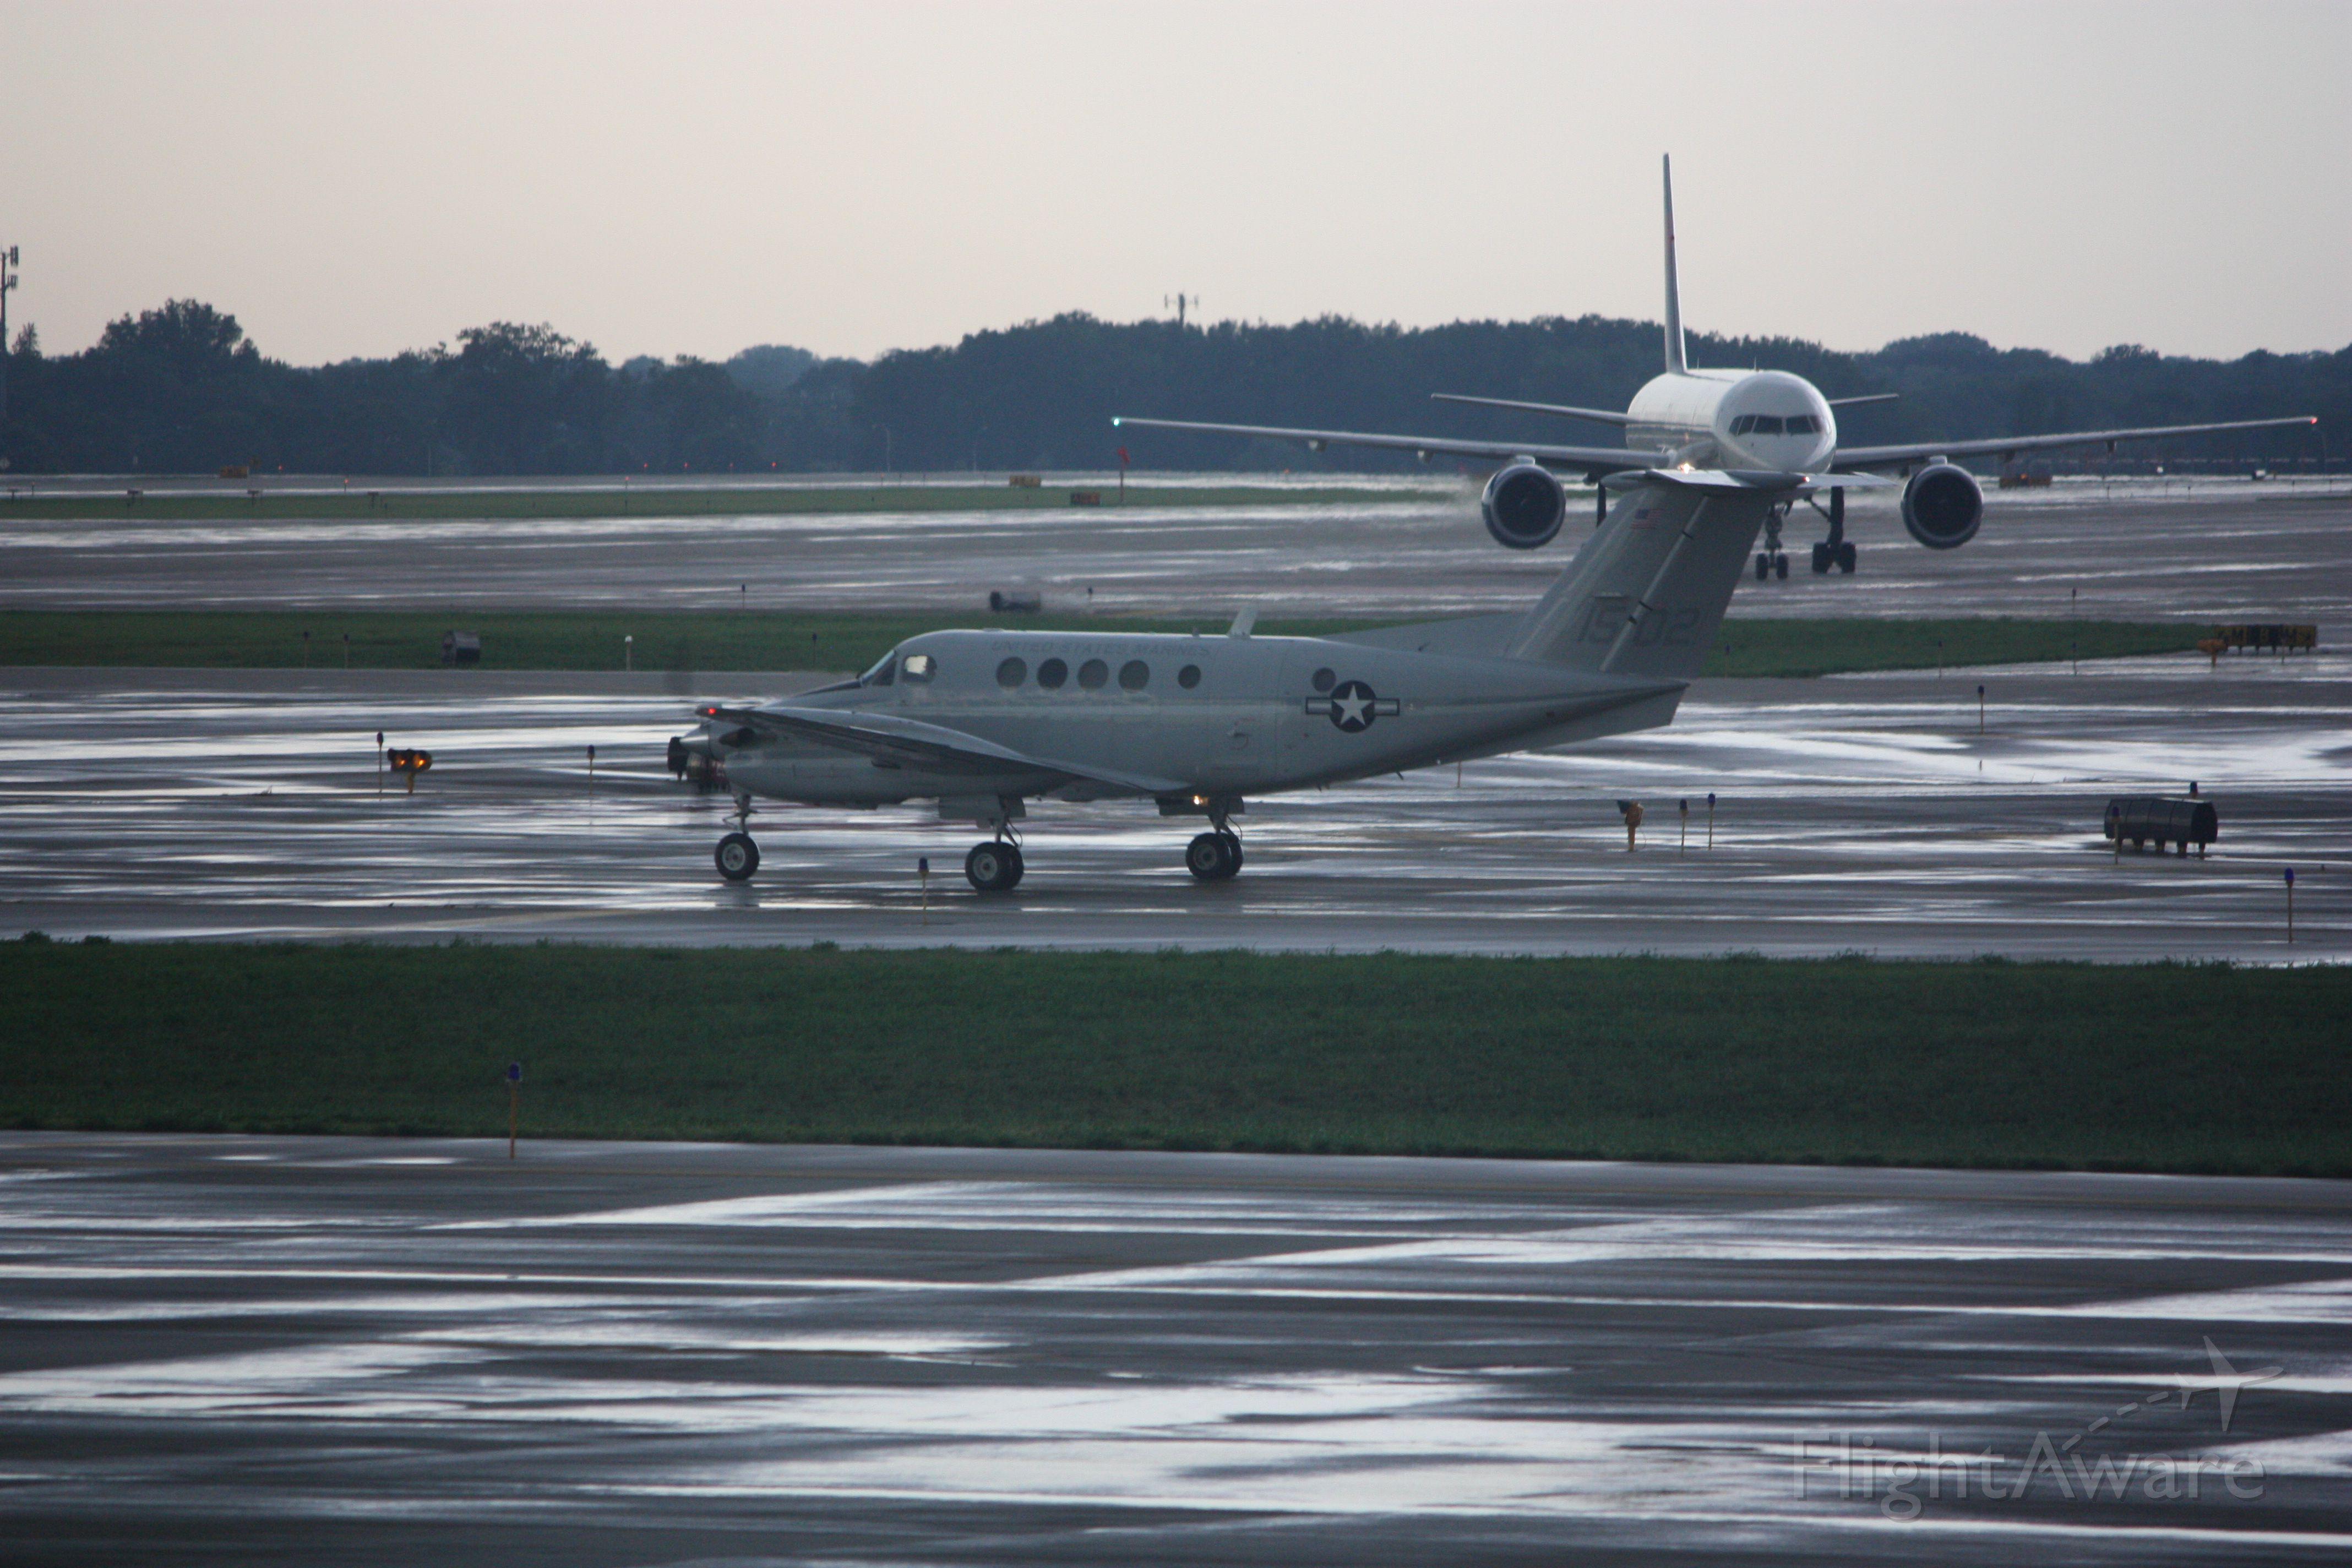 — — - USMC King Air tail number 1502 at KSLC